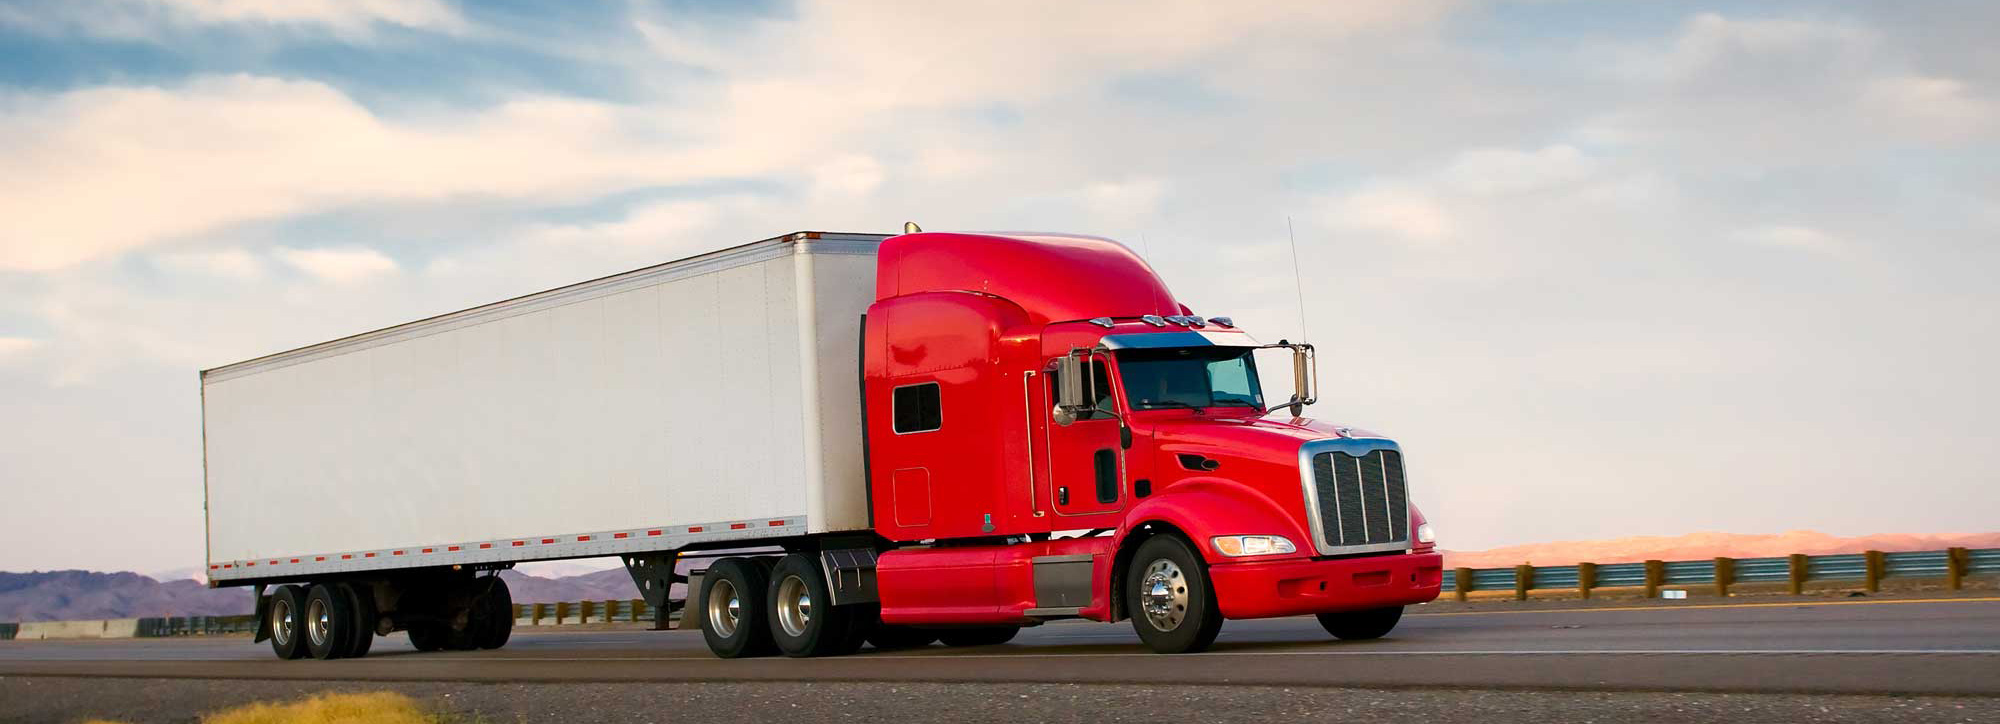 Stutsman-Logistics-Red-truck-dry-van-on-highway